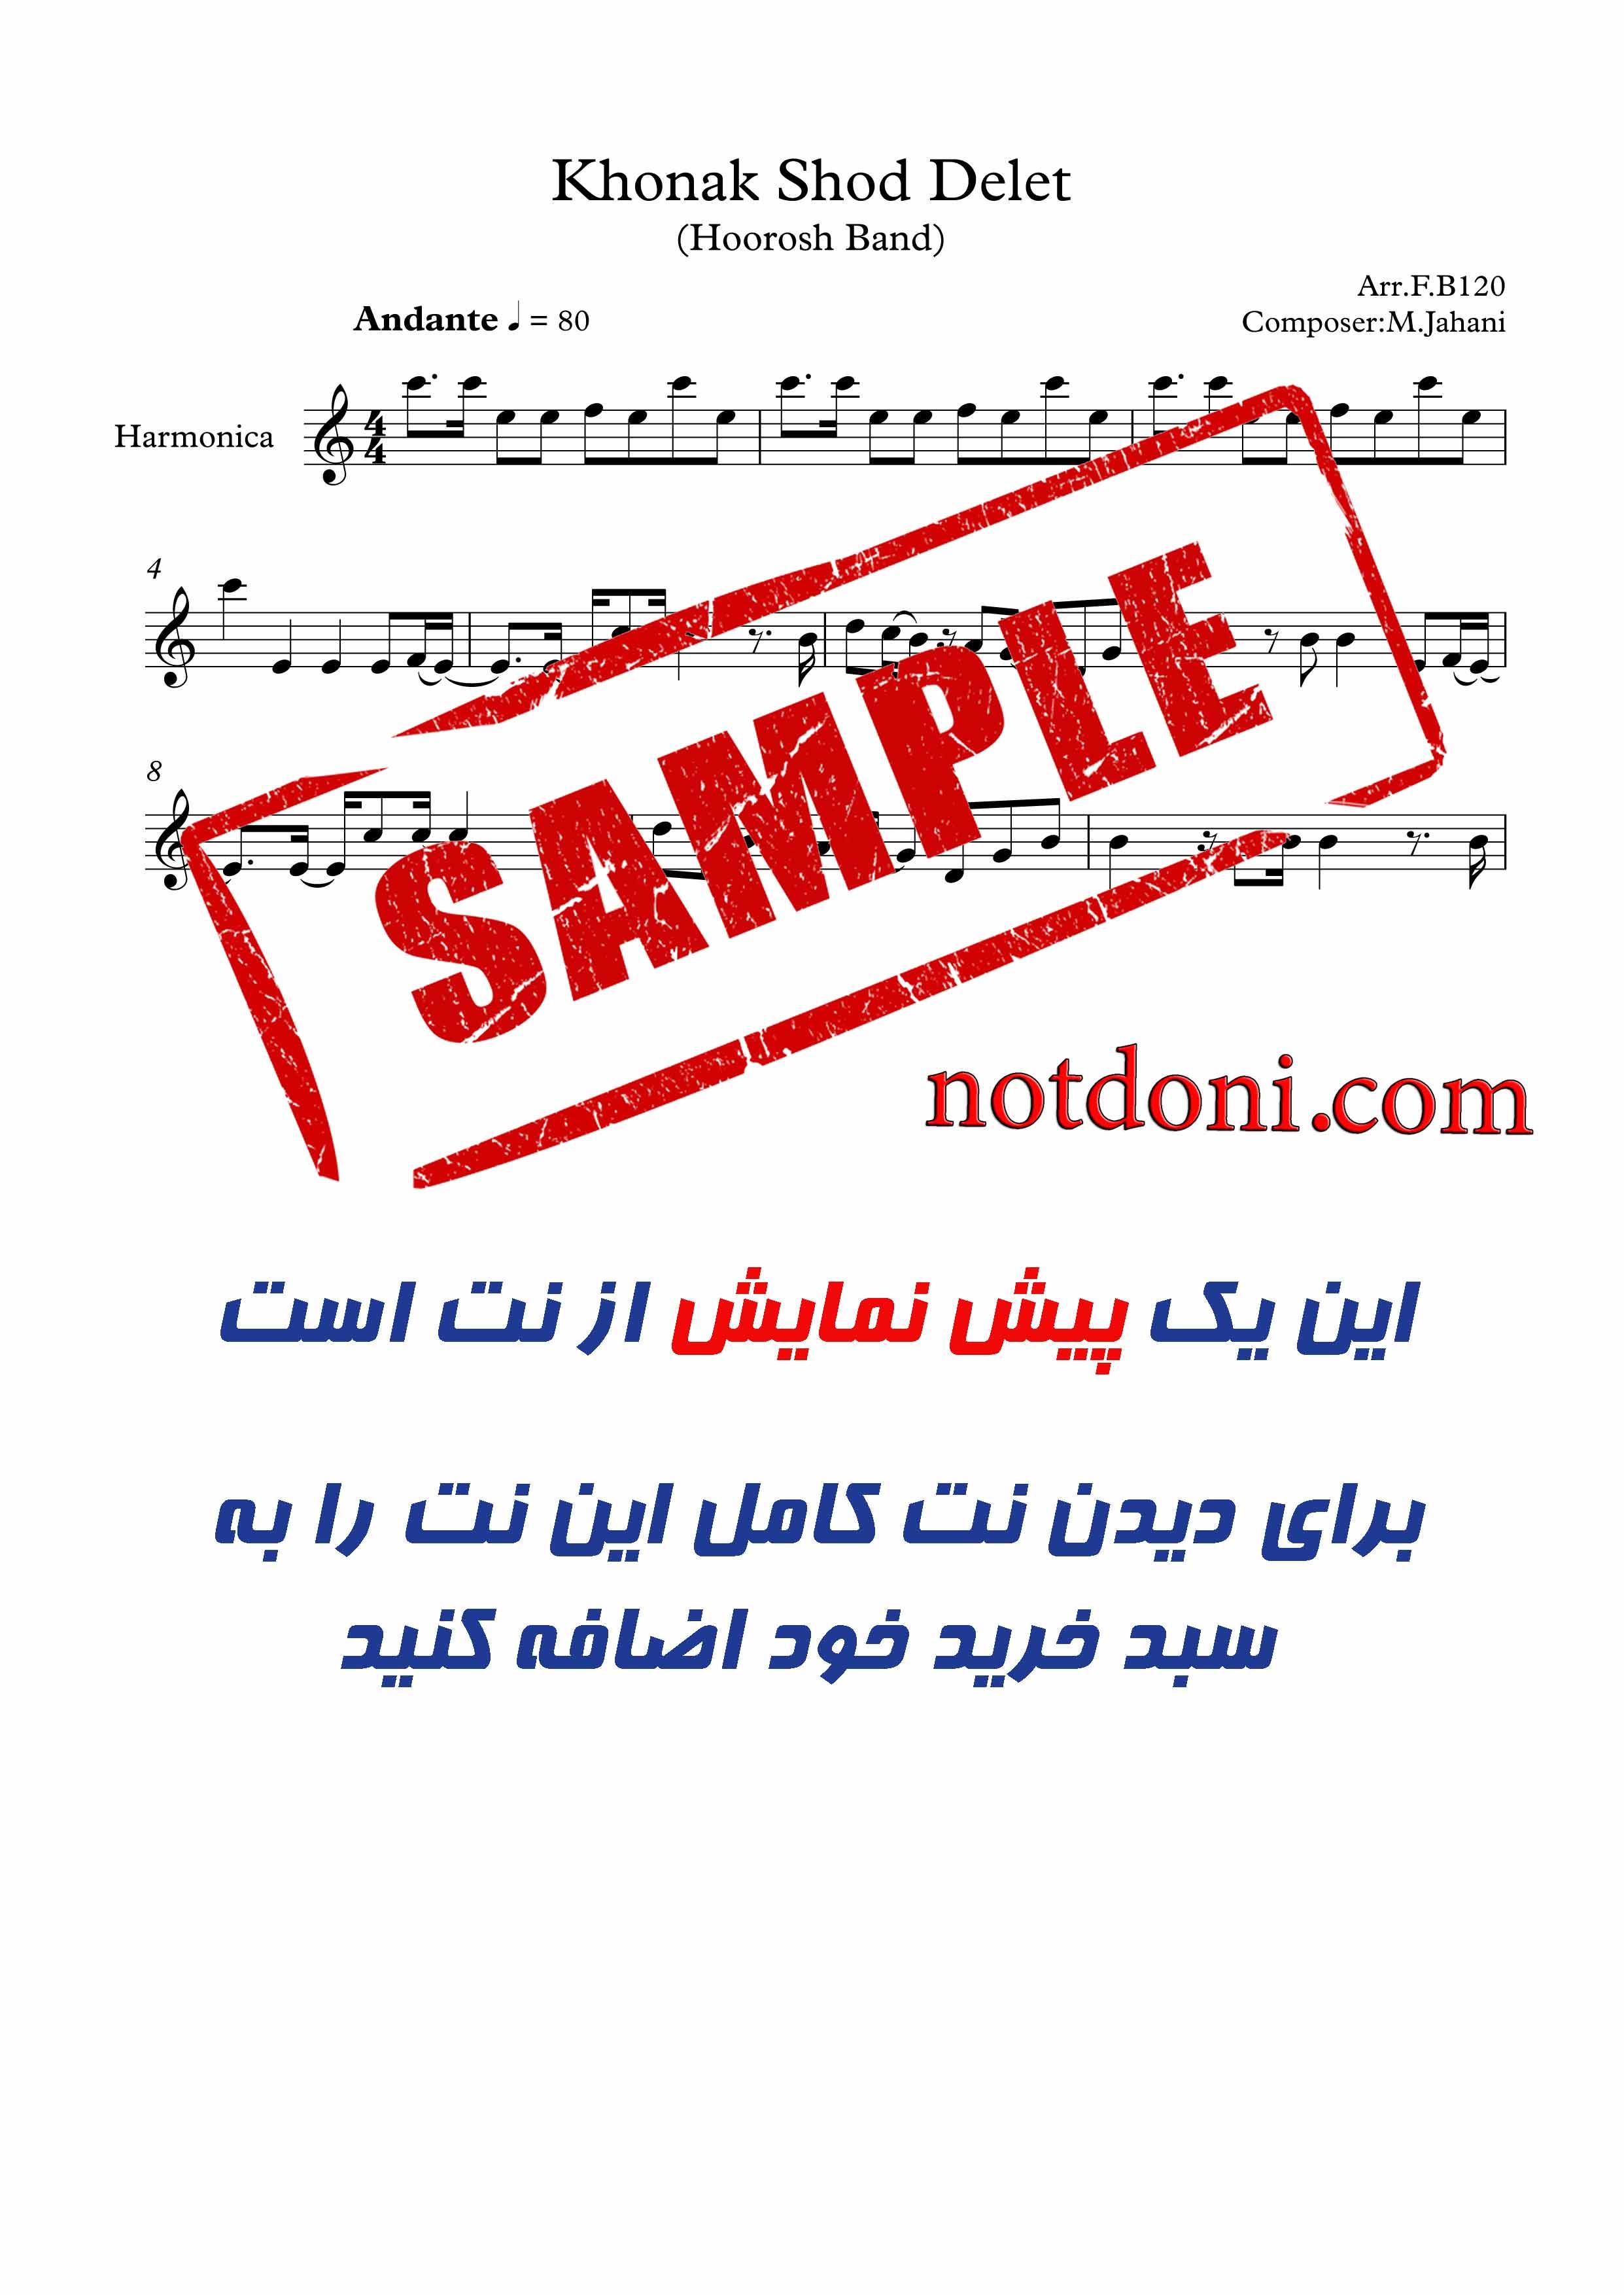 97d60627-c2fd-45c8-b7e0-9fca354b1097_دموی-نت-آهنگ-خنک-شد-دلت-هارمونیکا.jpg